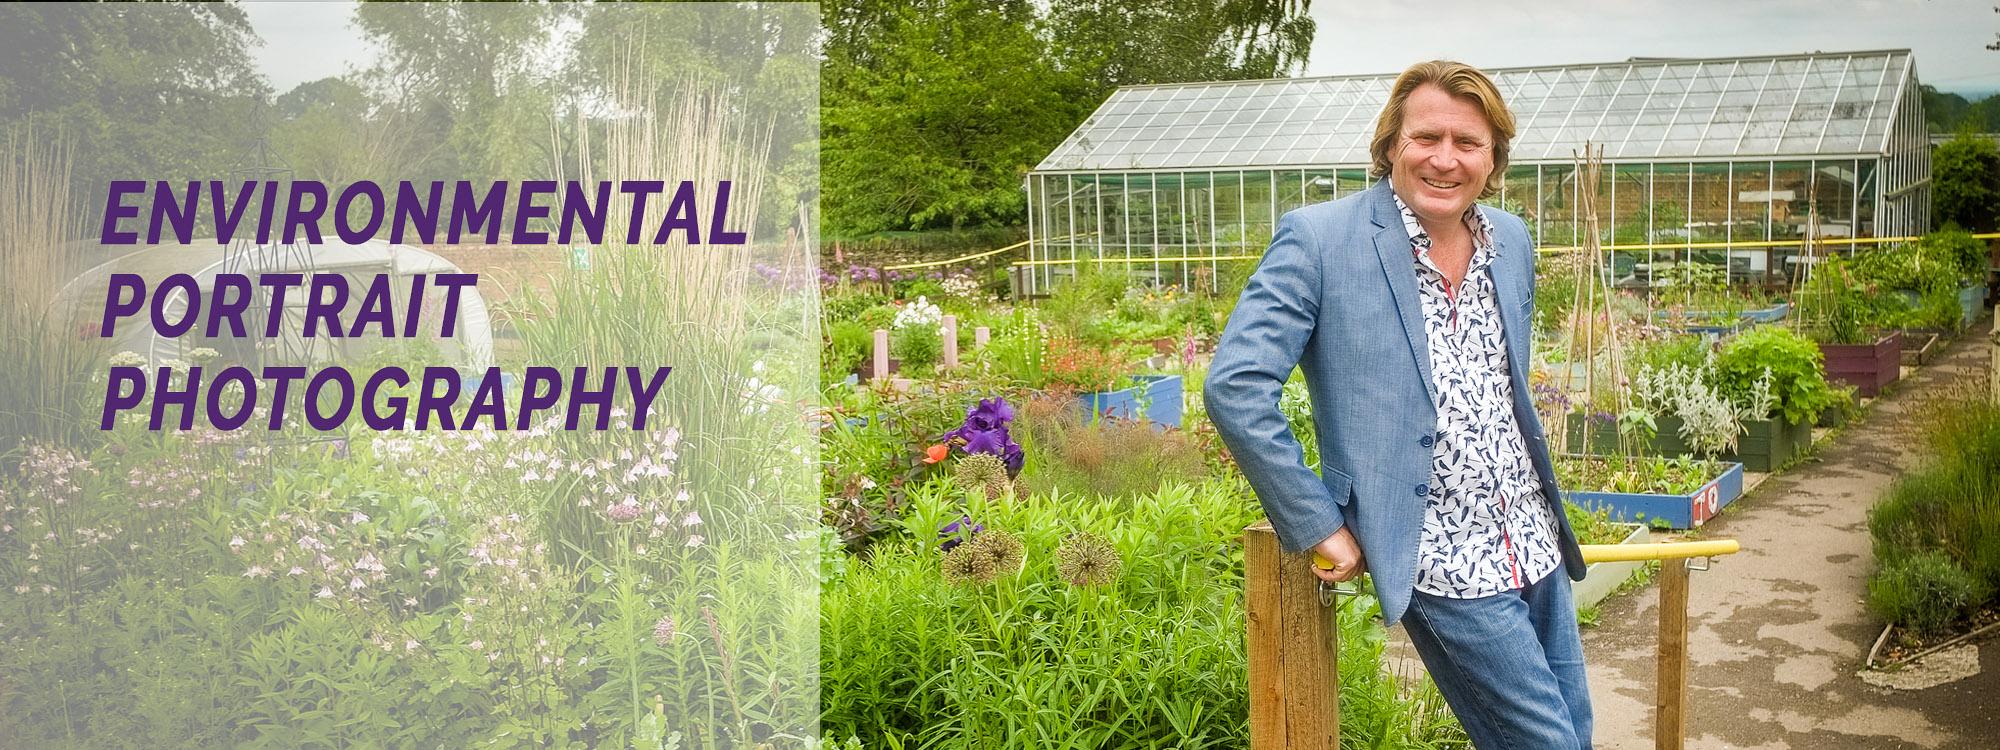 david domoney in the garden